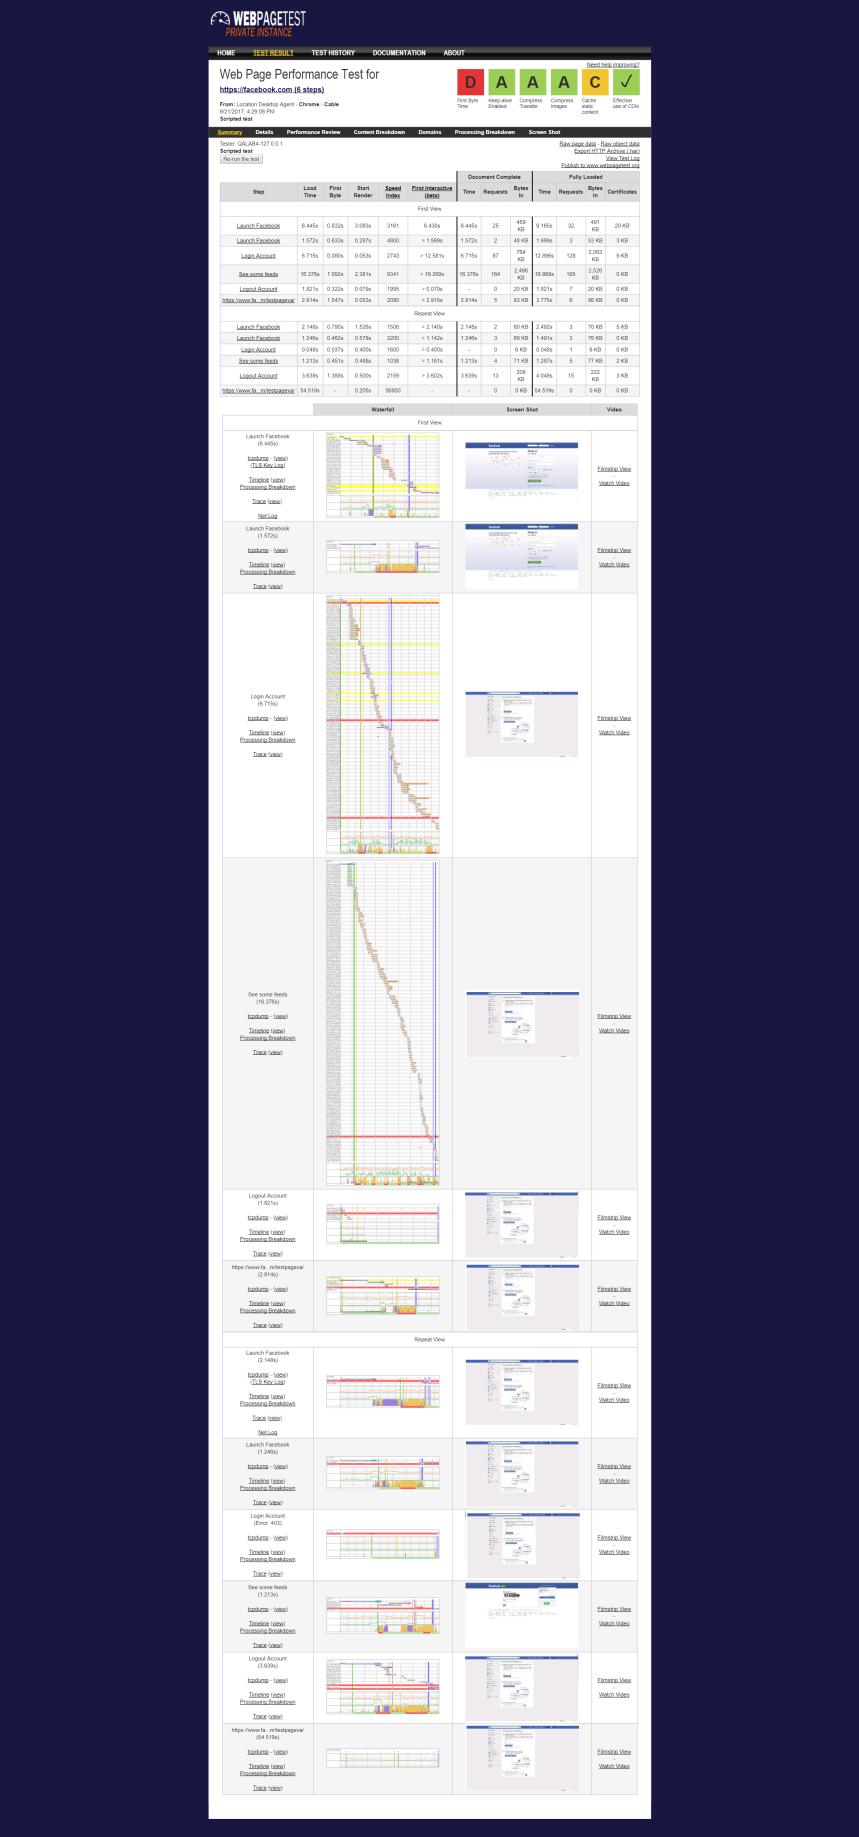 192.168.74.24-results.php-test=170921_YS_95d51d6d39bce229b9da7465923466ed